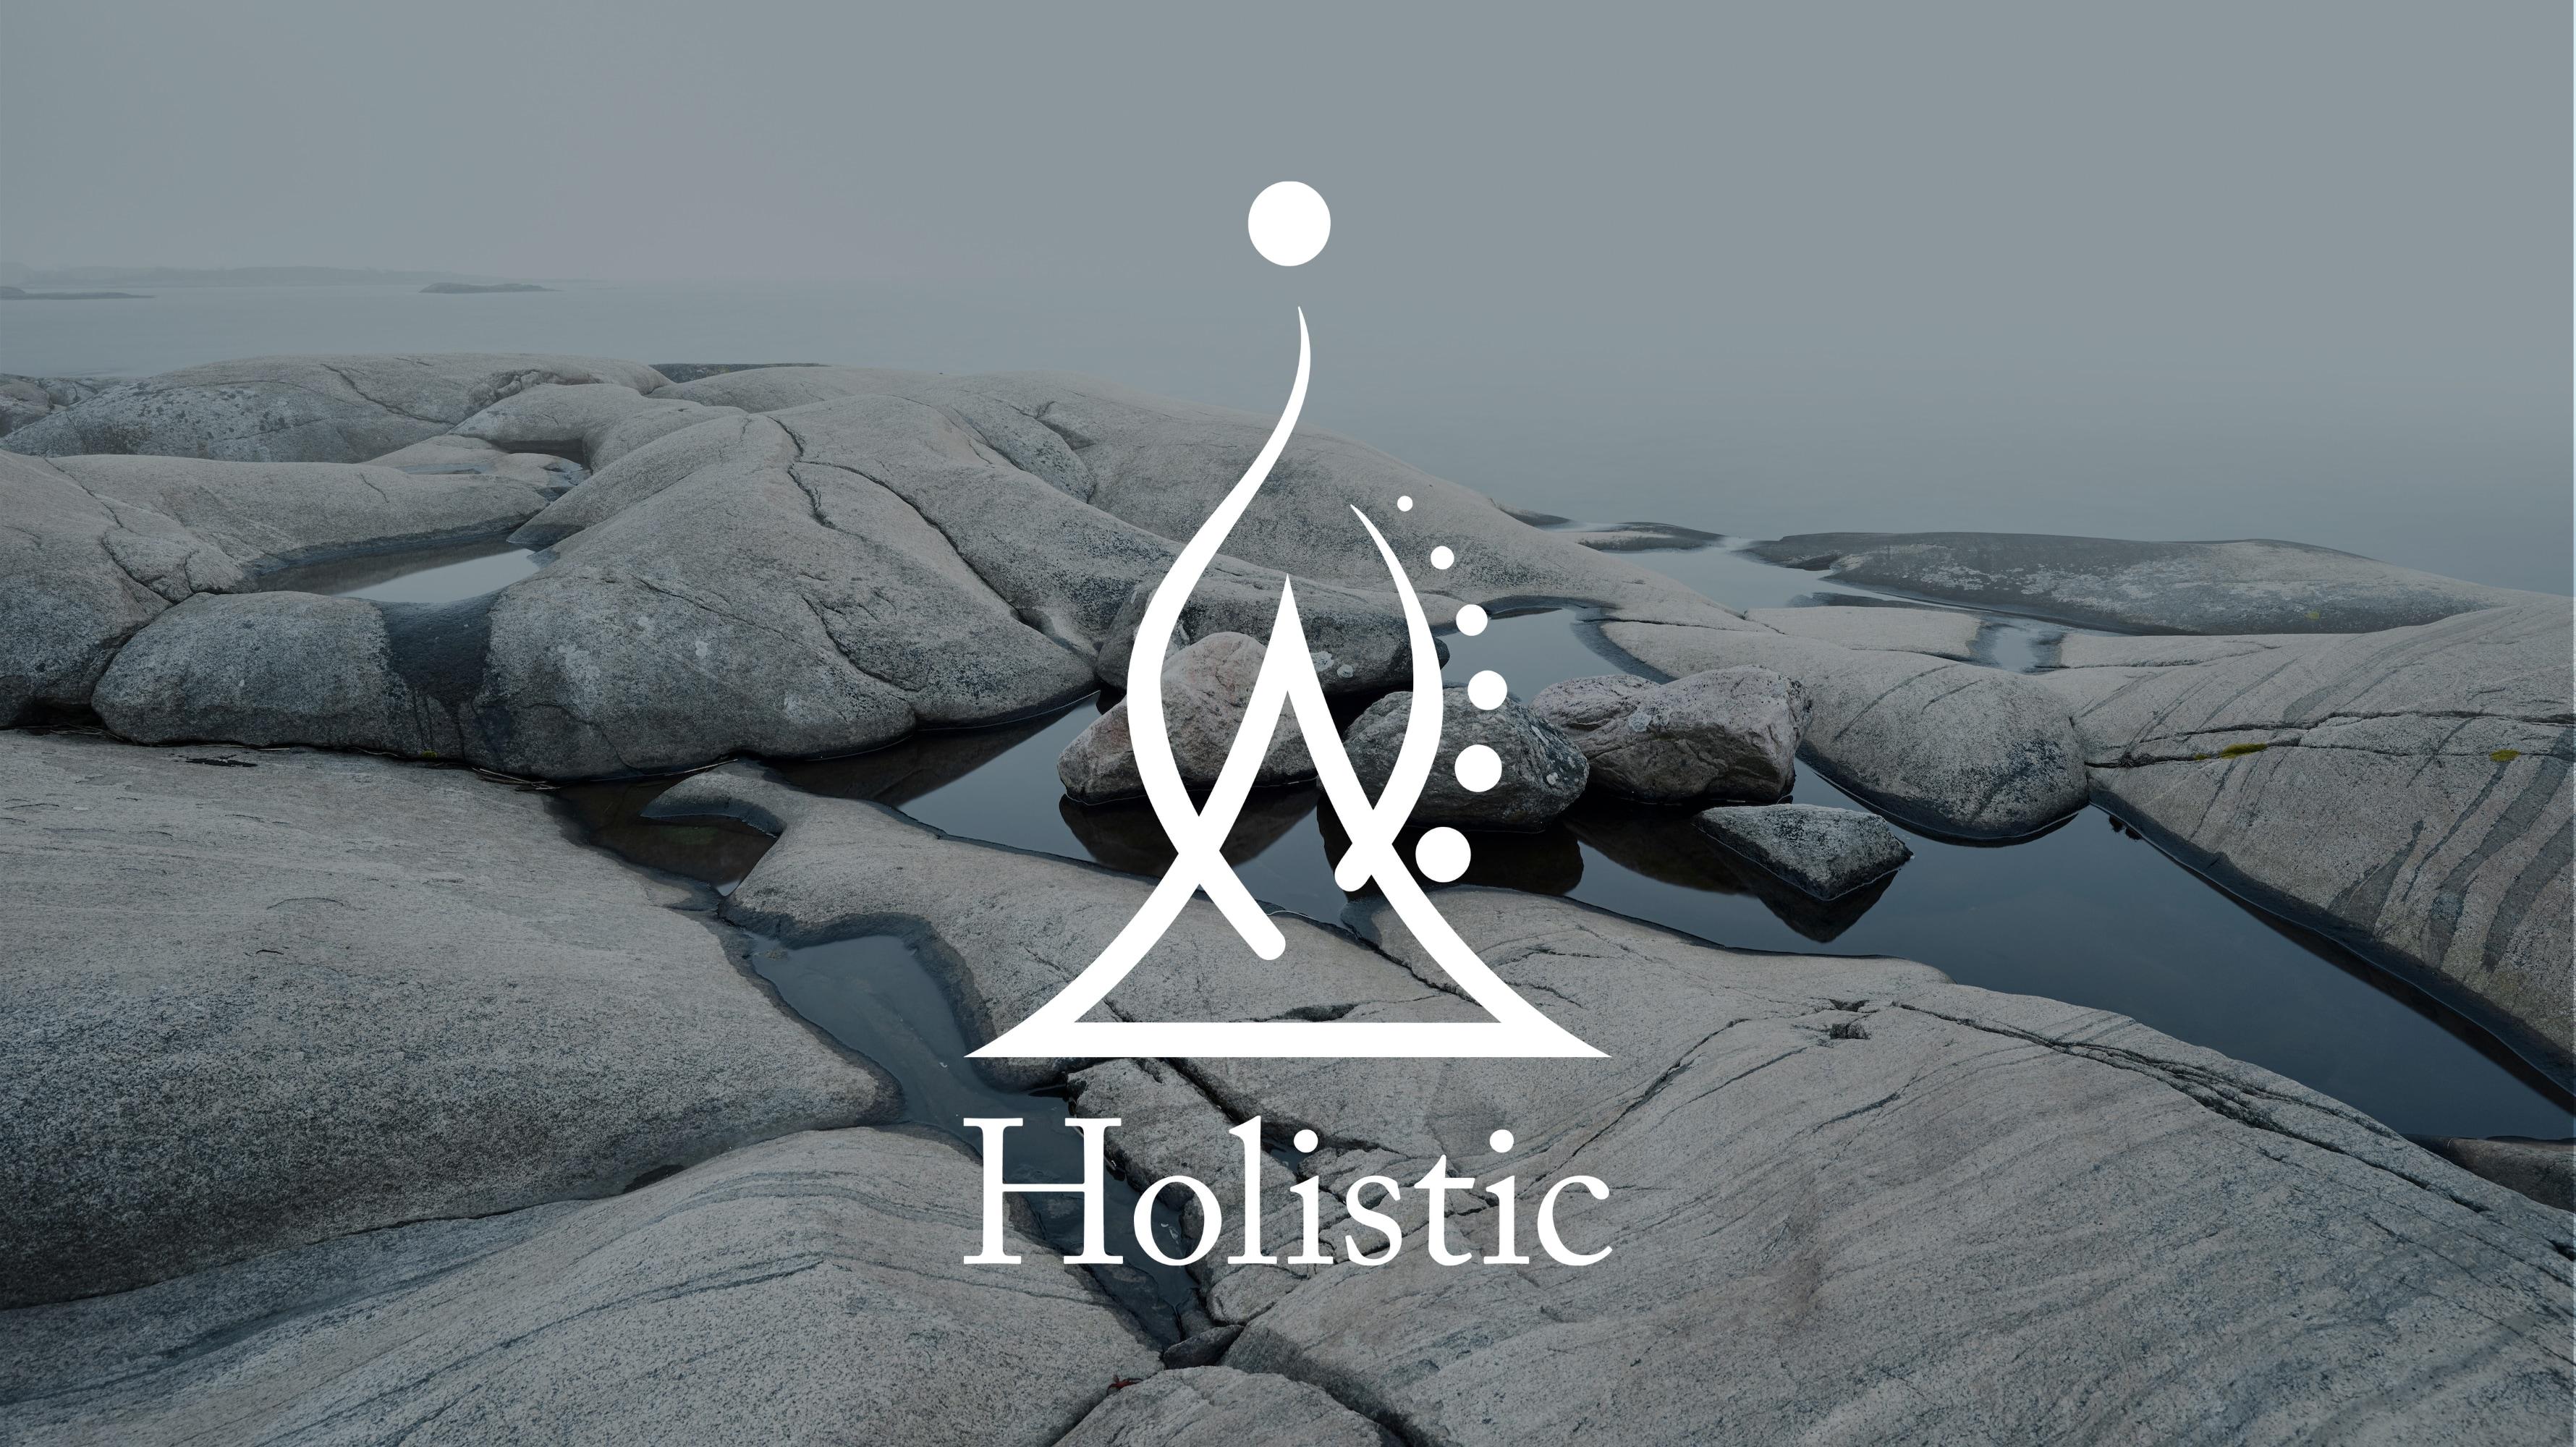 https://halsokosten.se/pub_images/original/Holistic_vm.png